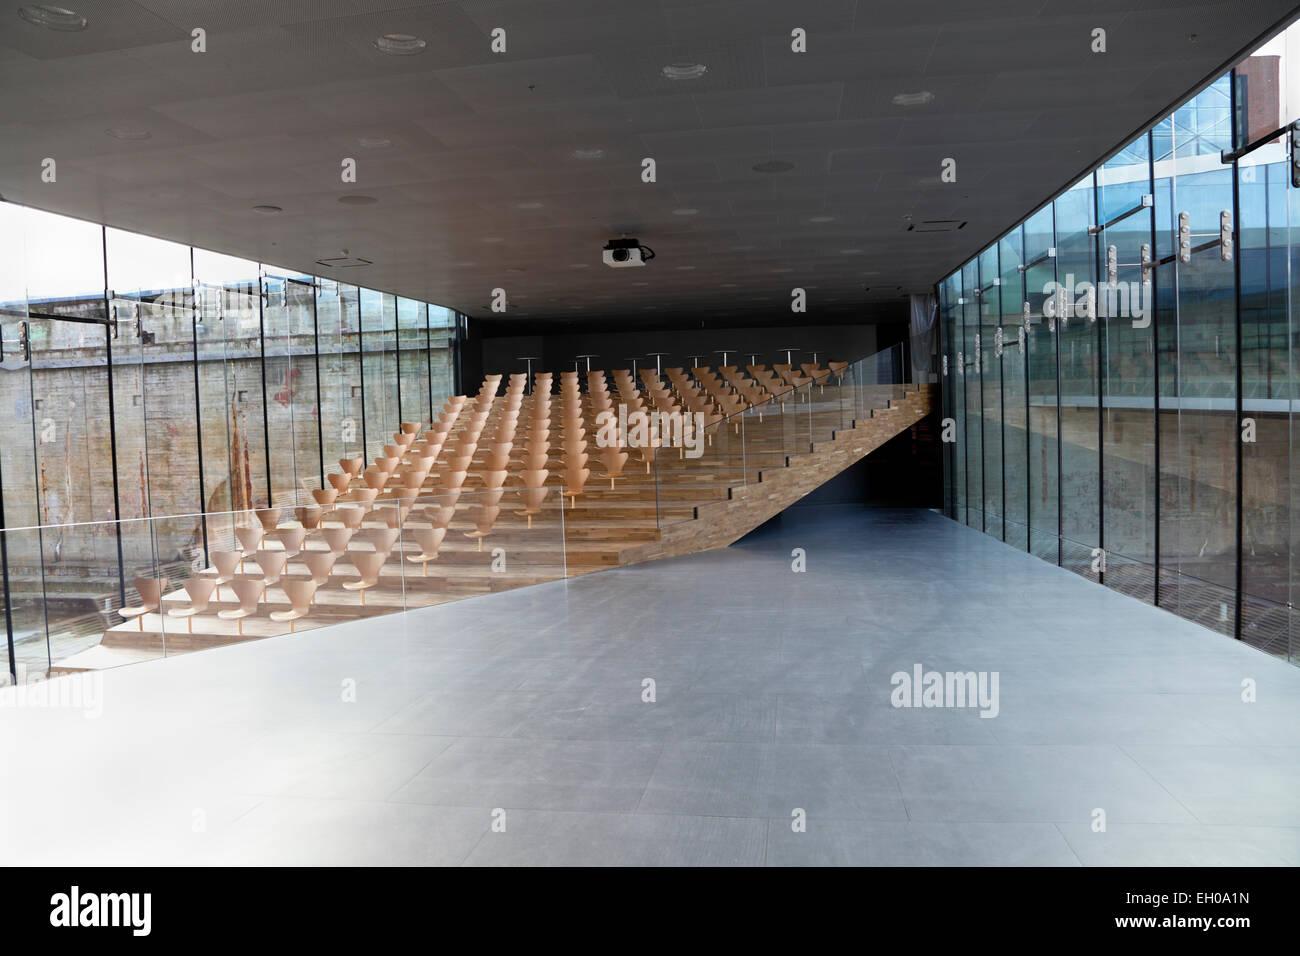 Lecture Theatre in the Maritime Museum of Denmark, M/S Museet for Søfart, Helsingør Denmark. Bjarke Ingels - Stock Image